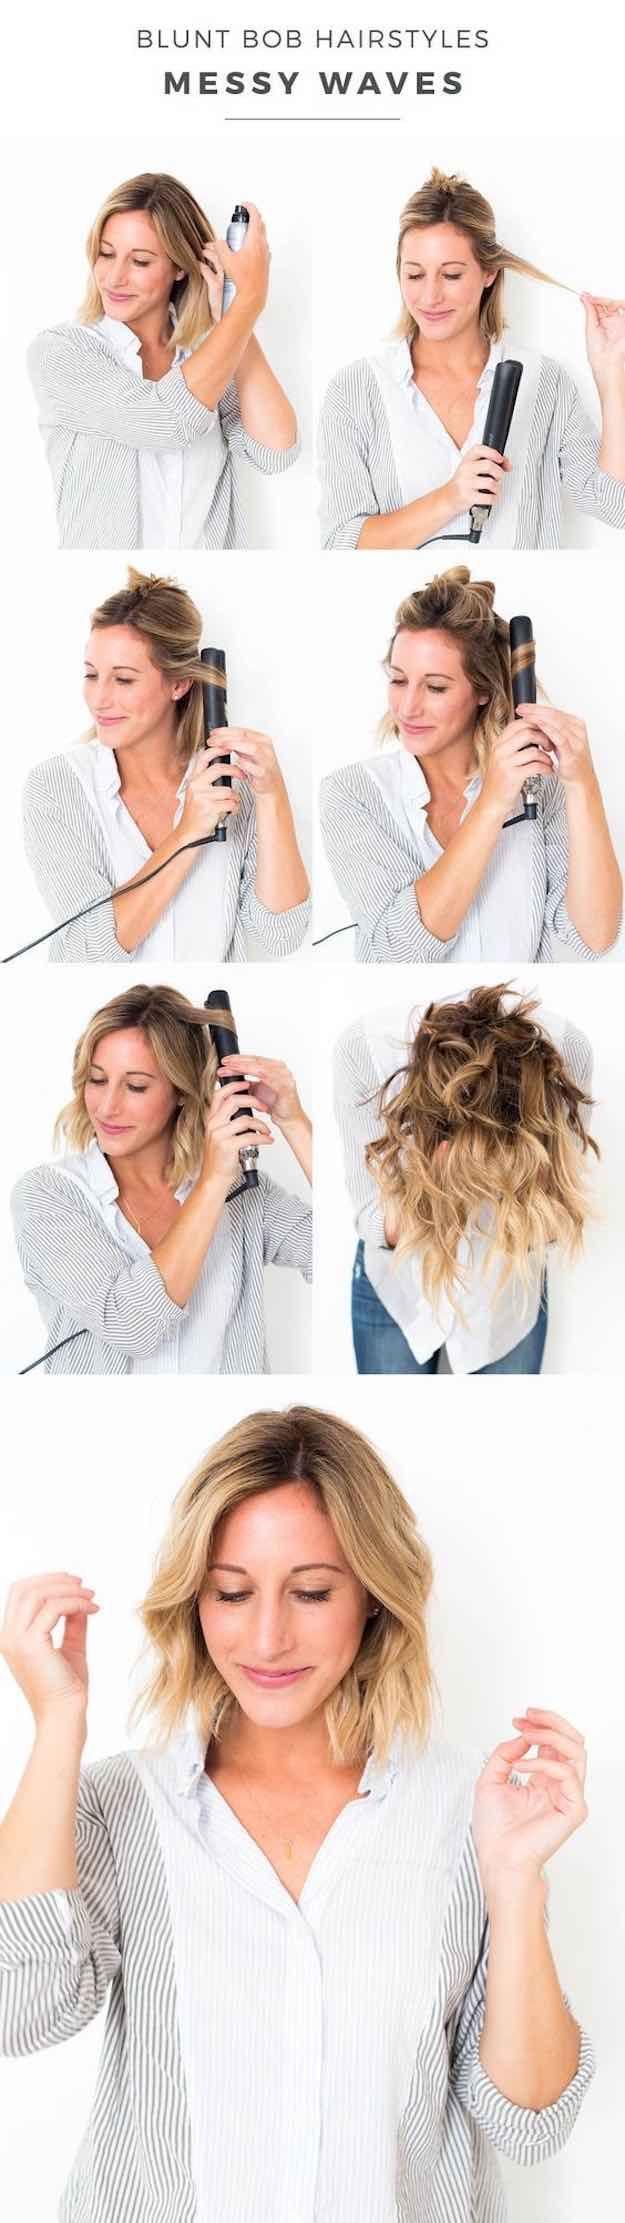 lob haircut ideas for women messy waves lob haircut and blunt bob